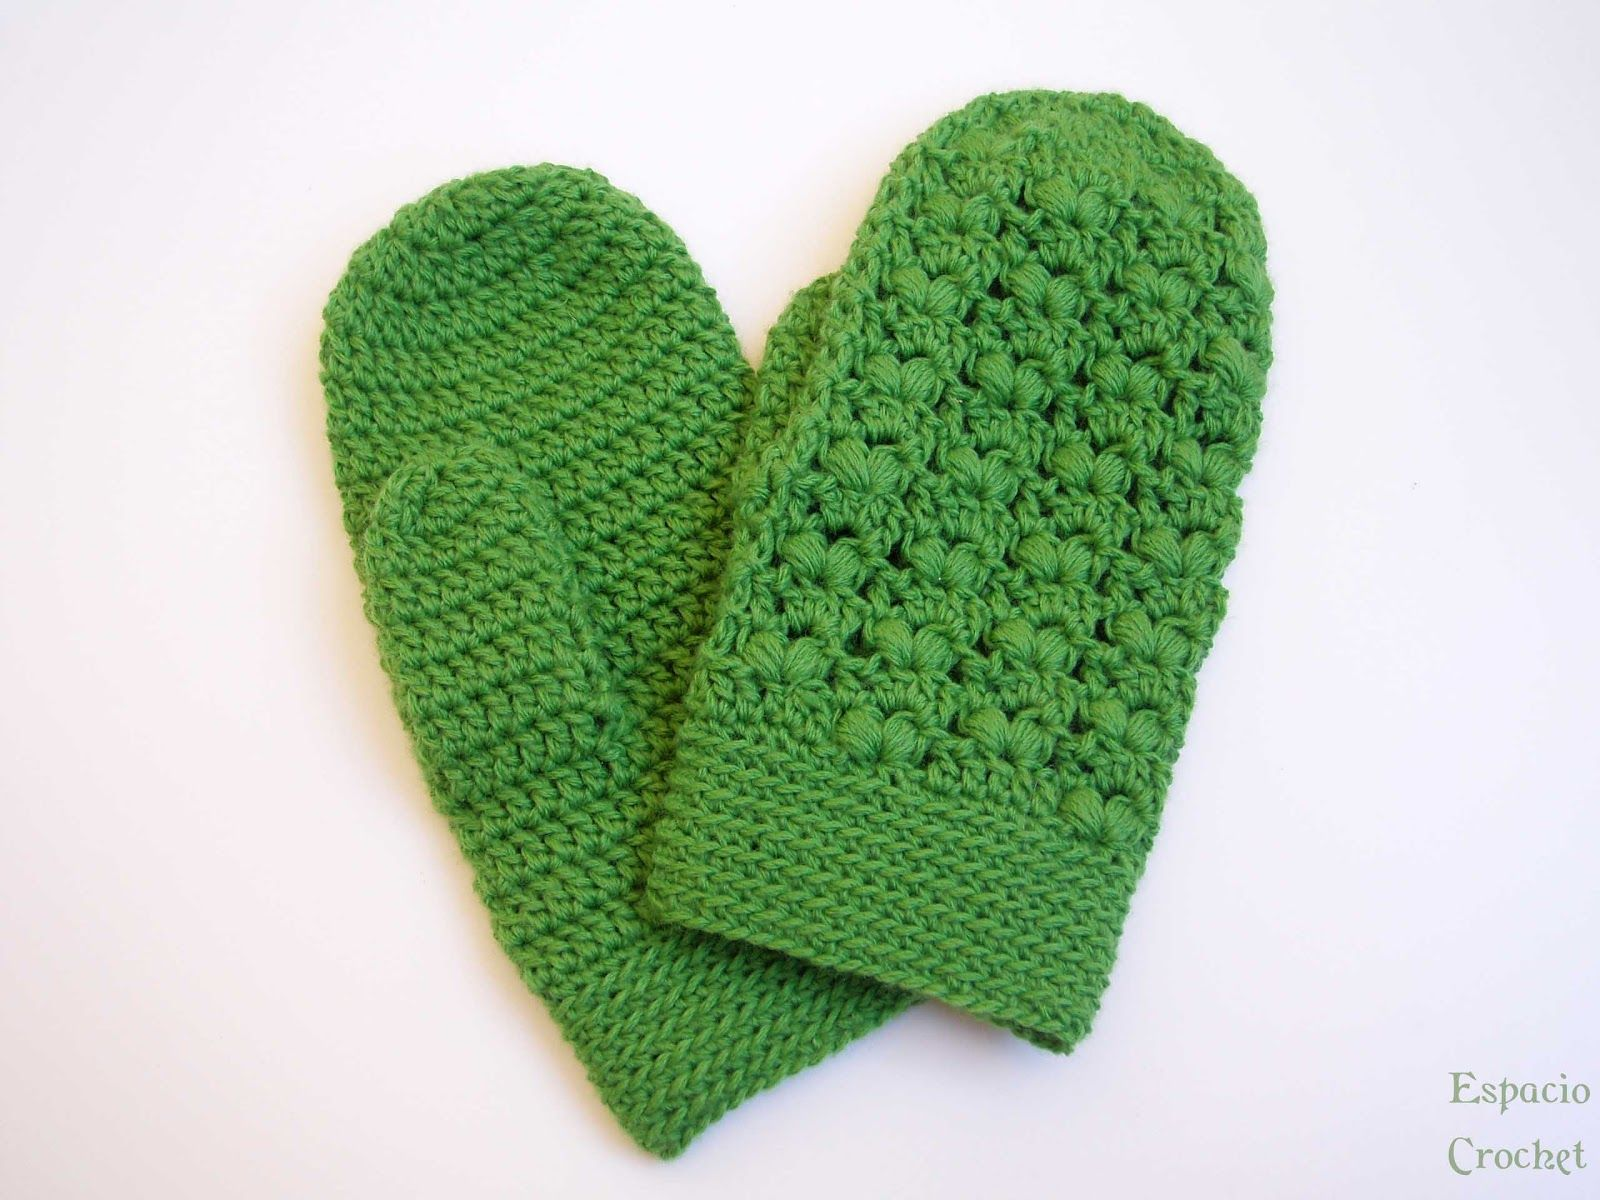 Espacio Crochet: Manoplas | Crochet mittens, gloves and sleeves ...